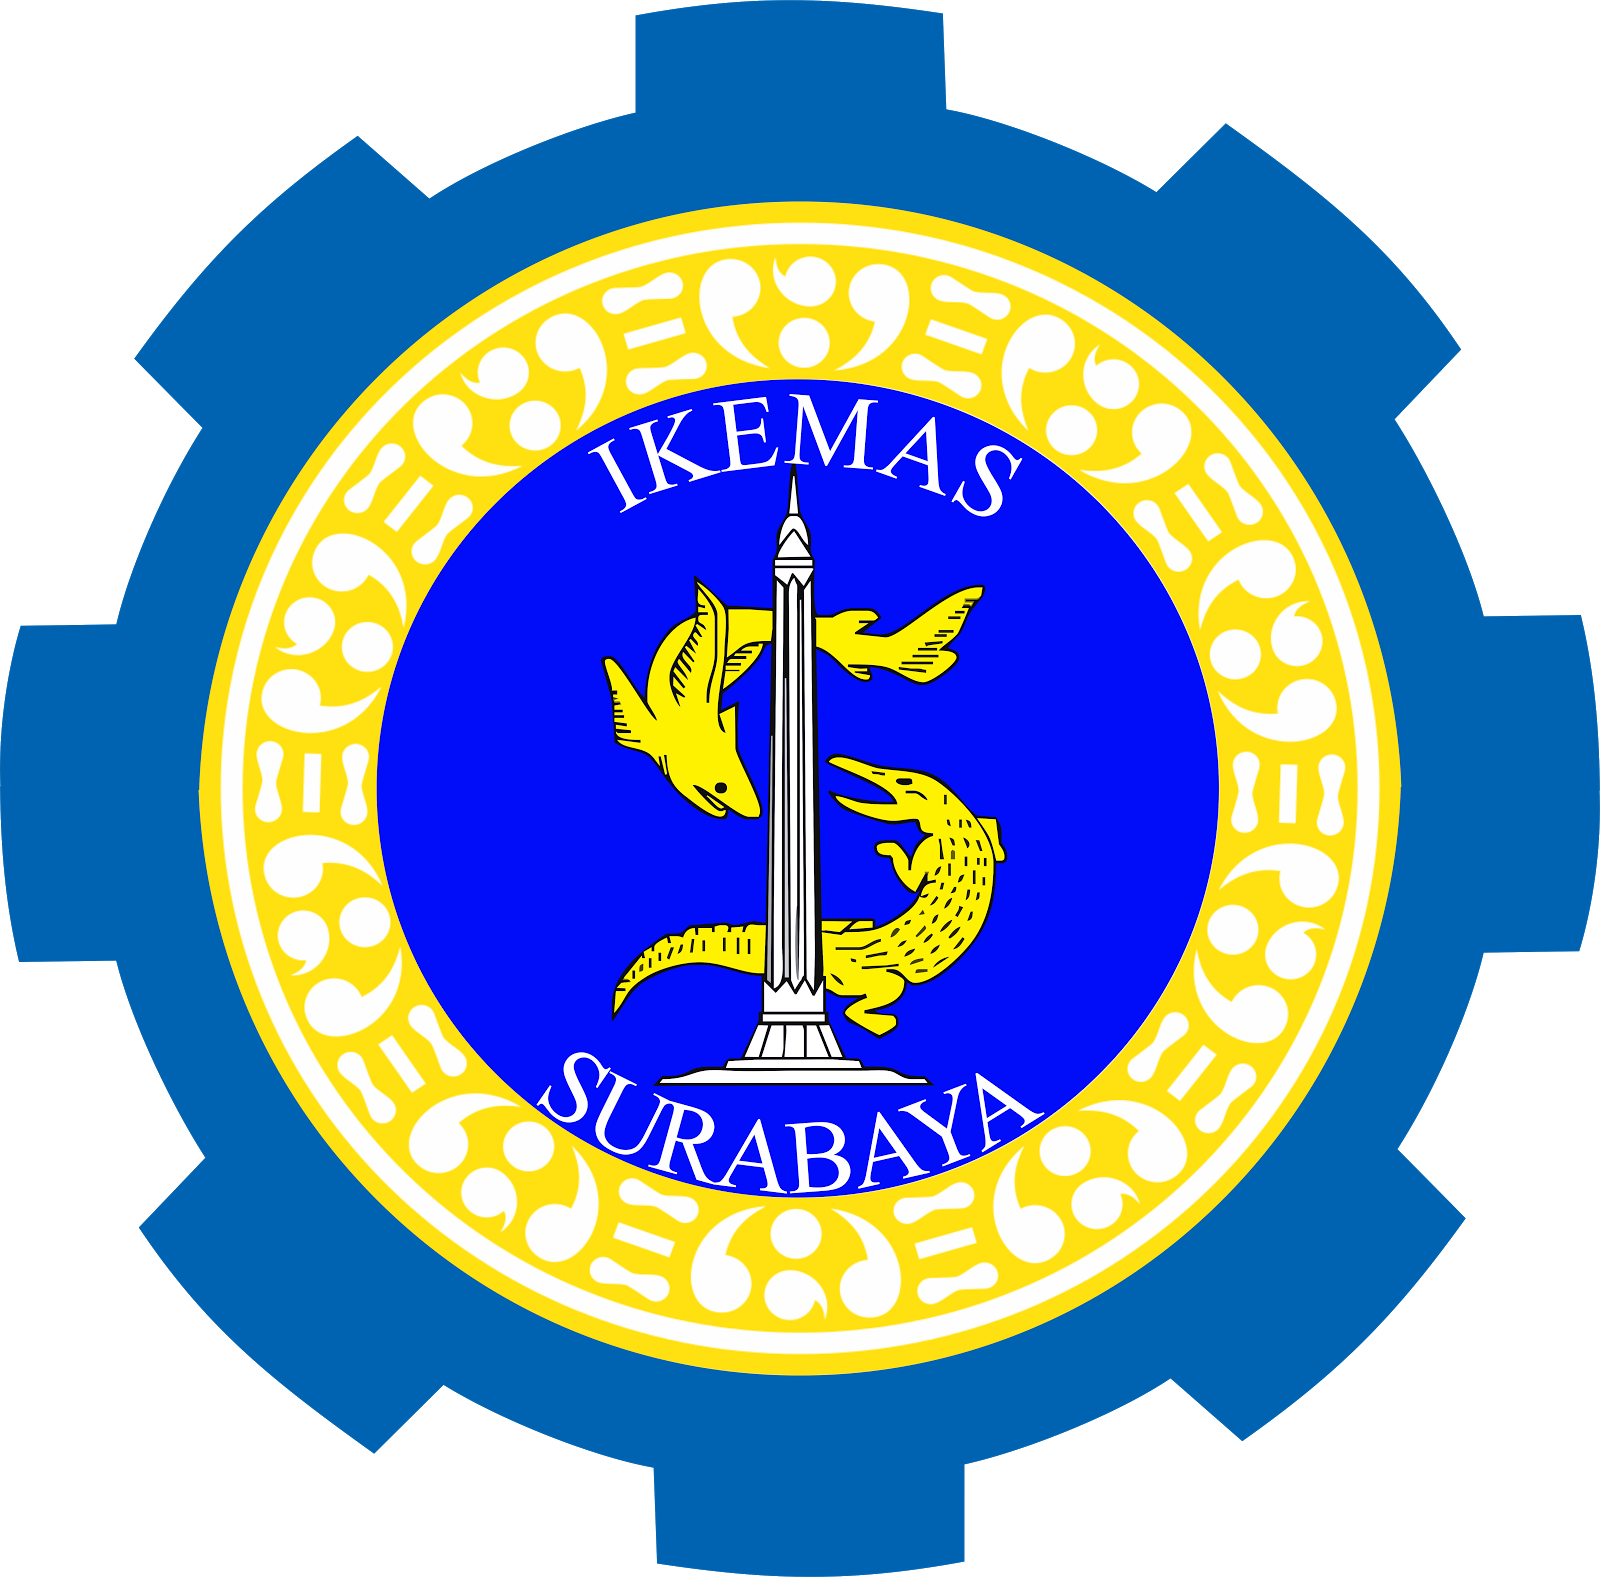 Ikemas Surabaya